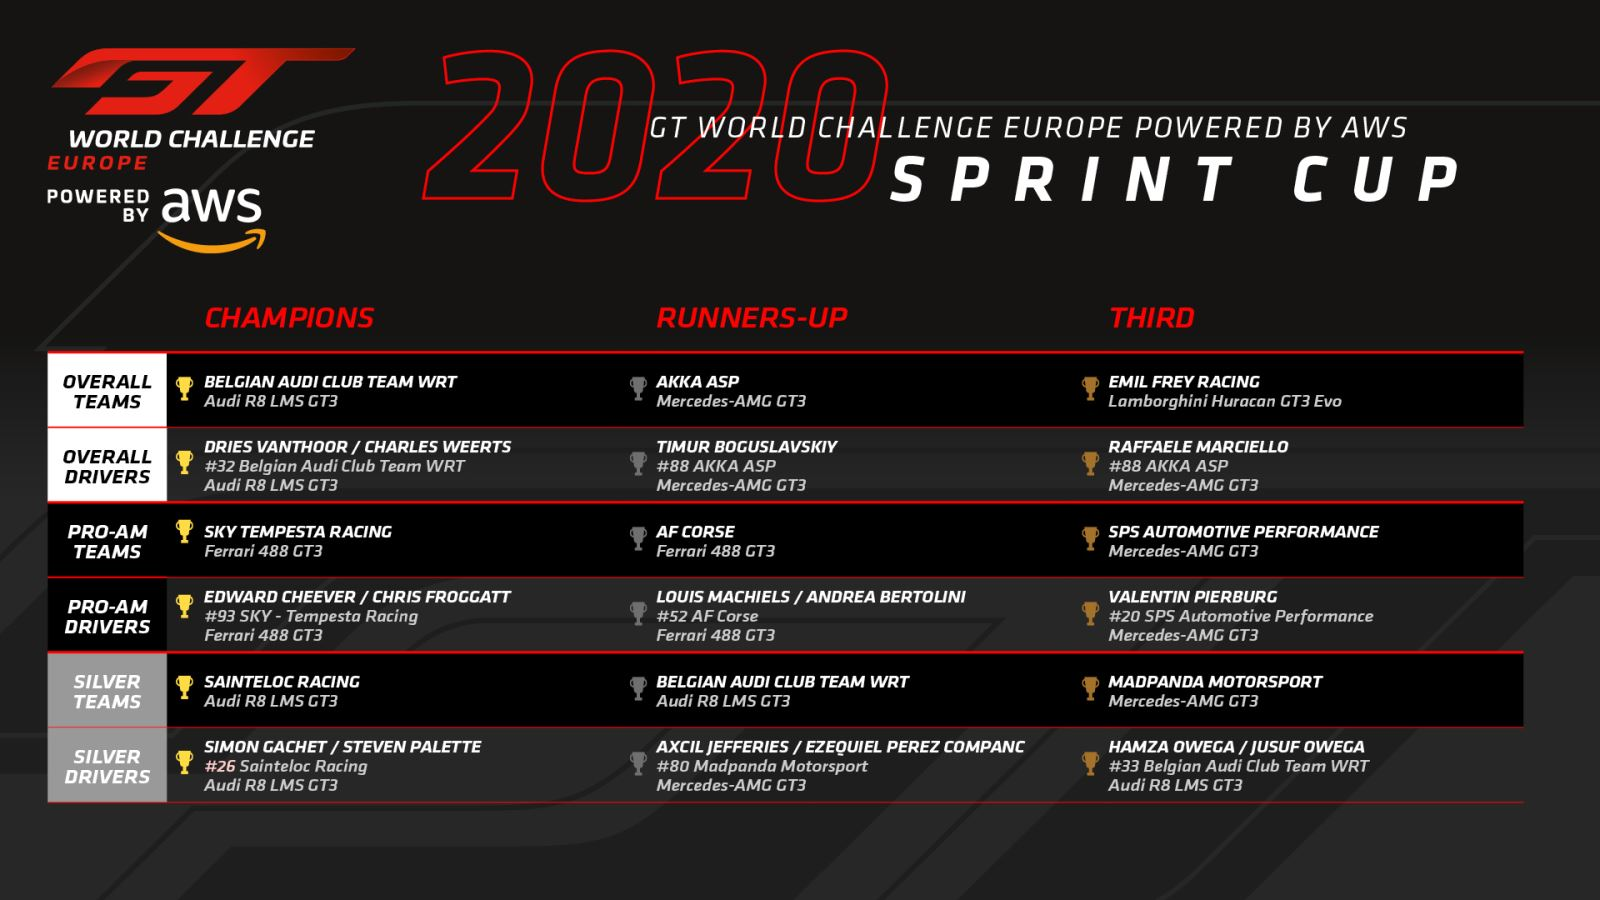 GT WC Europe Sprint : Grand final à Barcelone